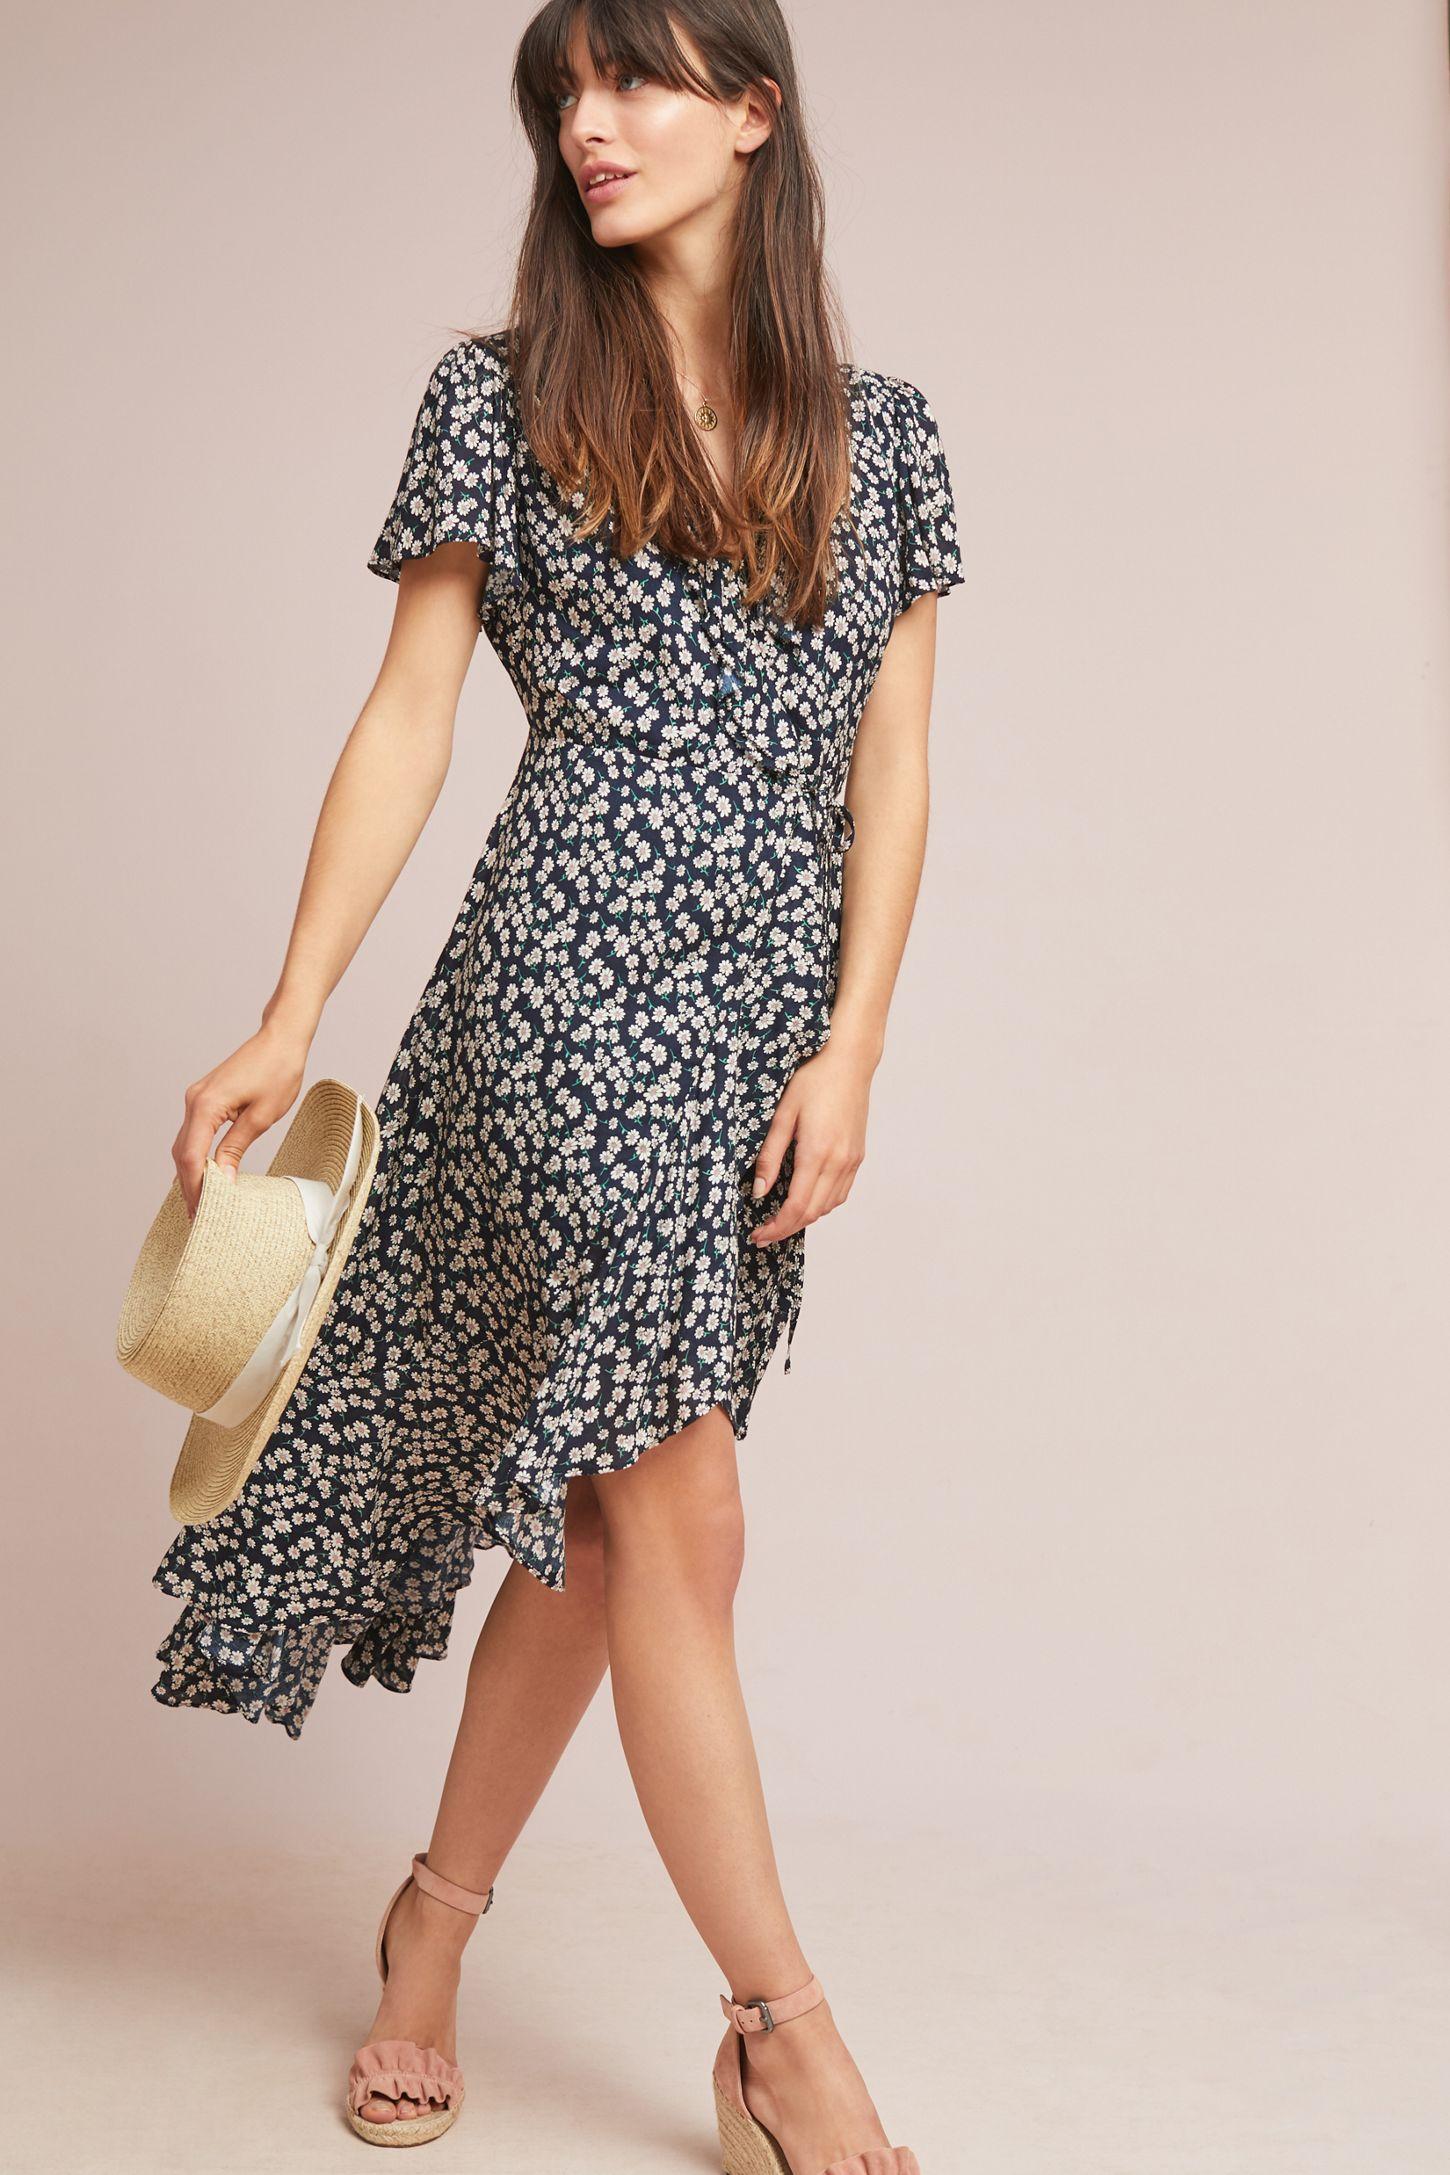 cfe8f1bfe2 Araceli Petite Maxi Dress